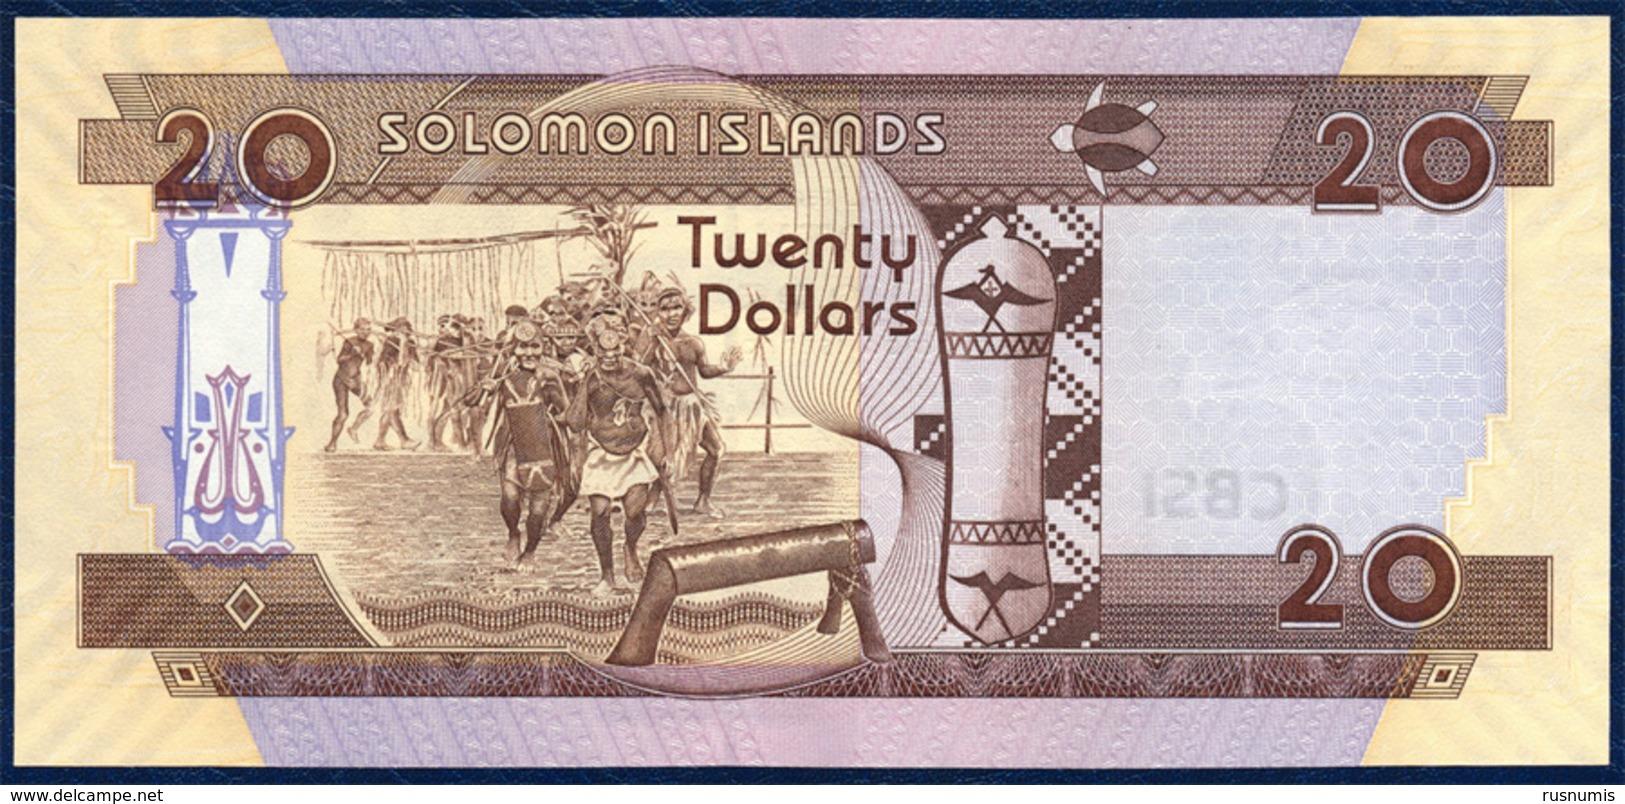 SOLOMON ISLANDS 20 DOLLARS P-28b 2011 UNC - Salomons